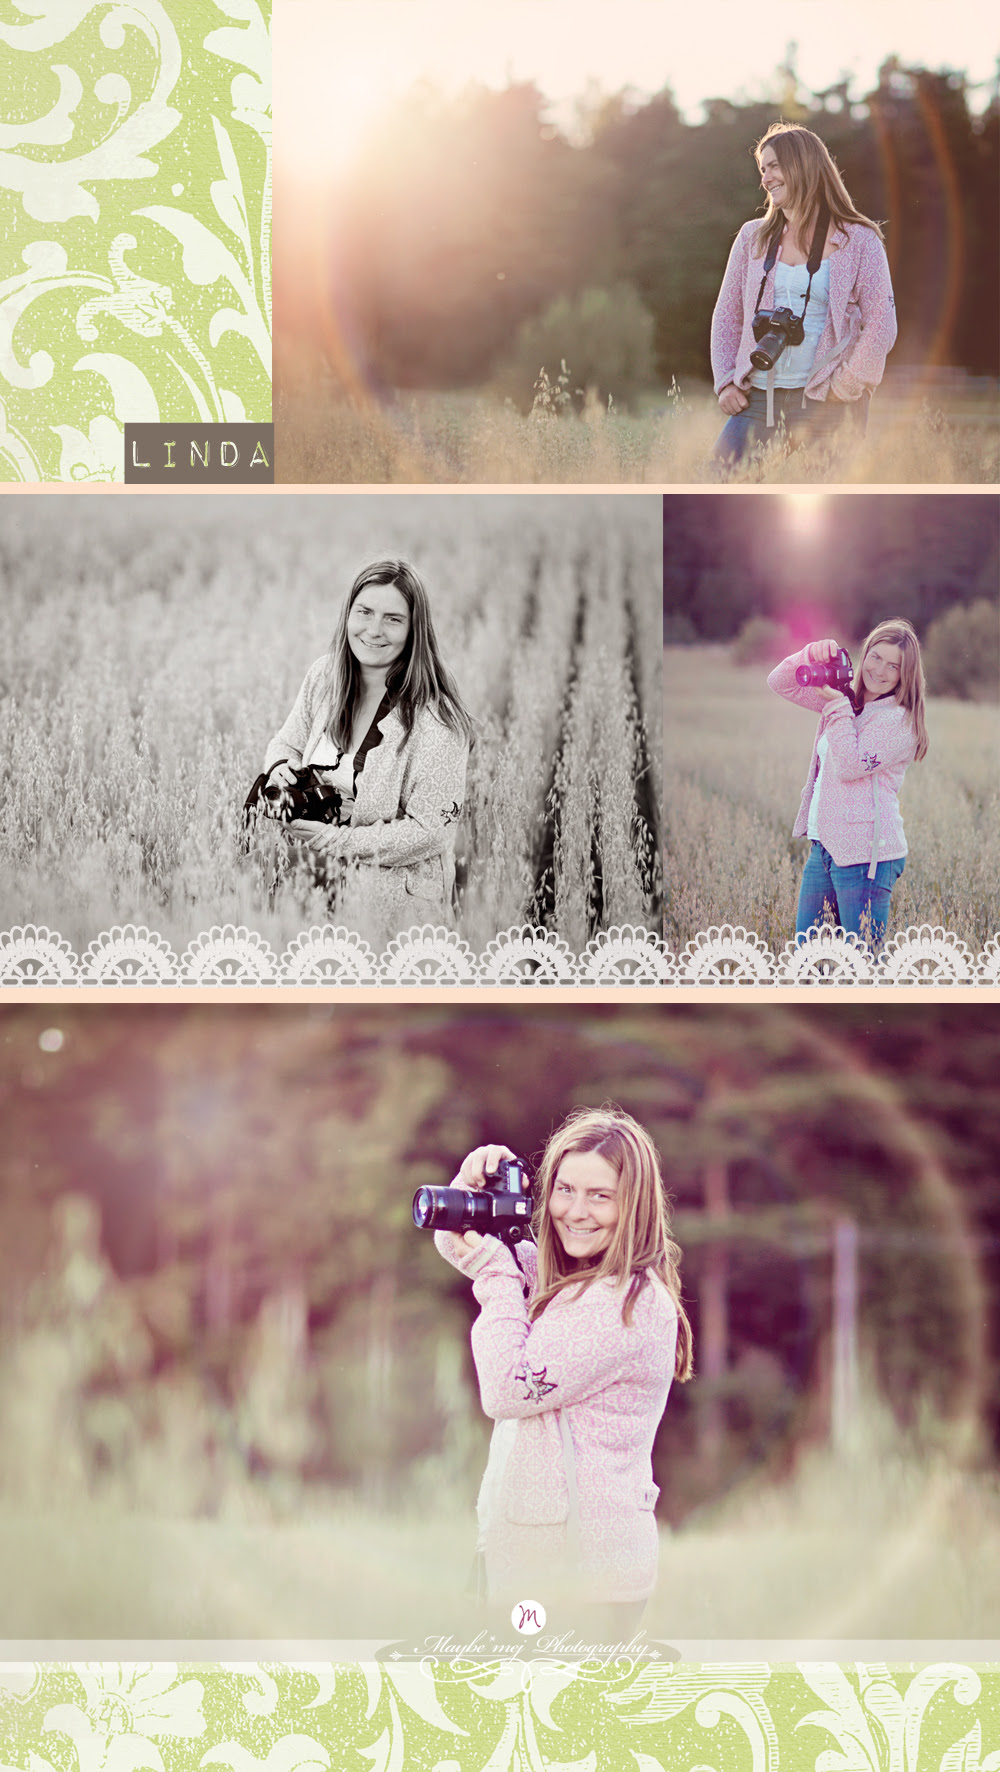 6-collage-linda